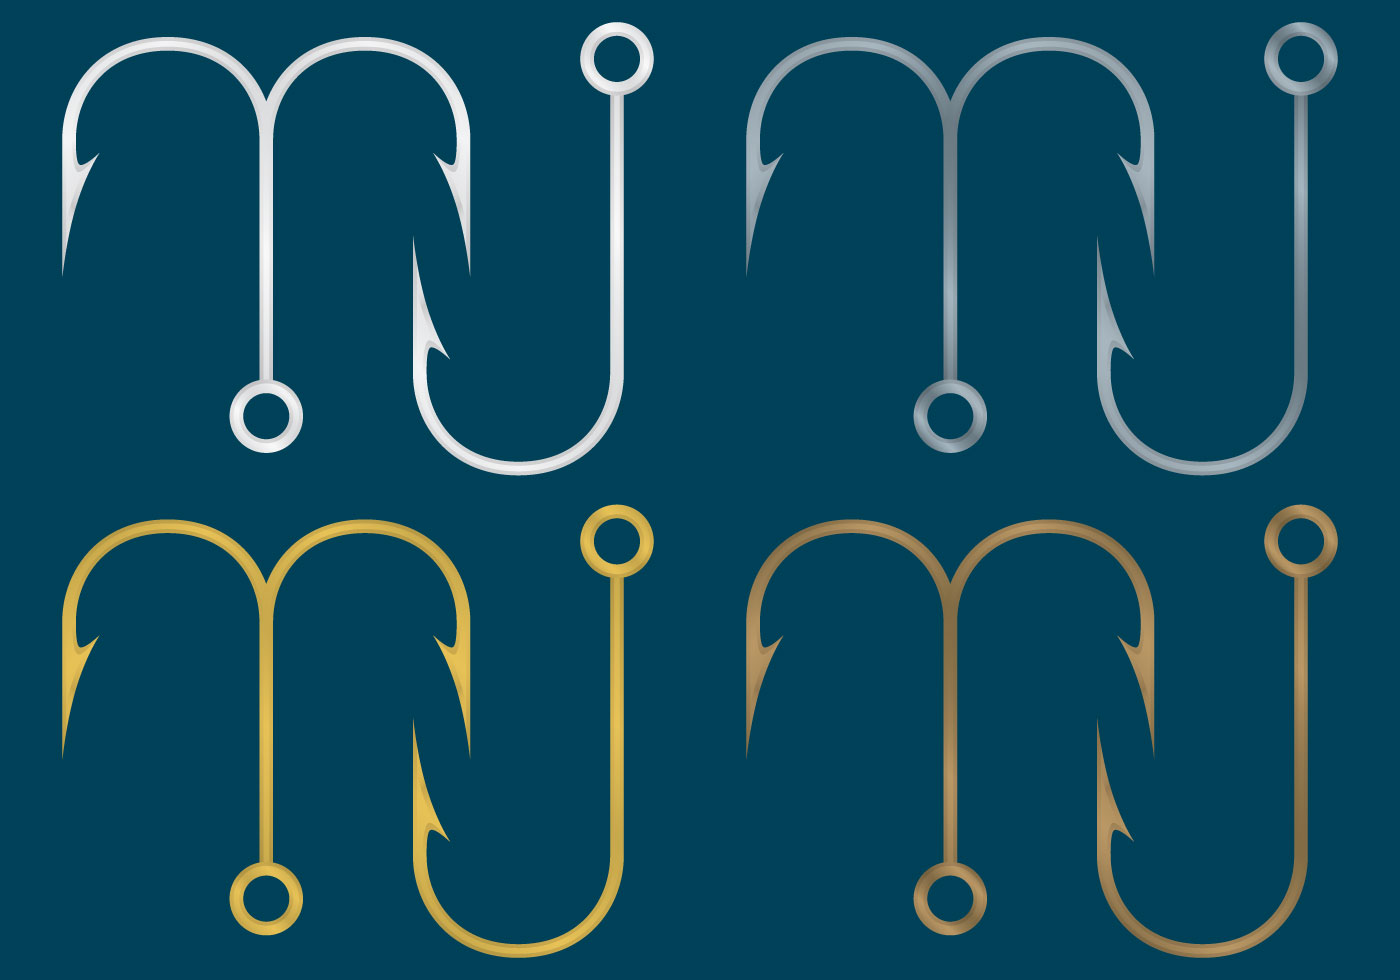 Fish Hook Vectors - Download Free Vector Art, Stock ...